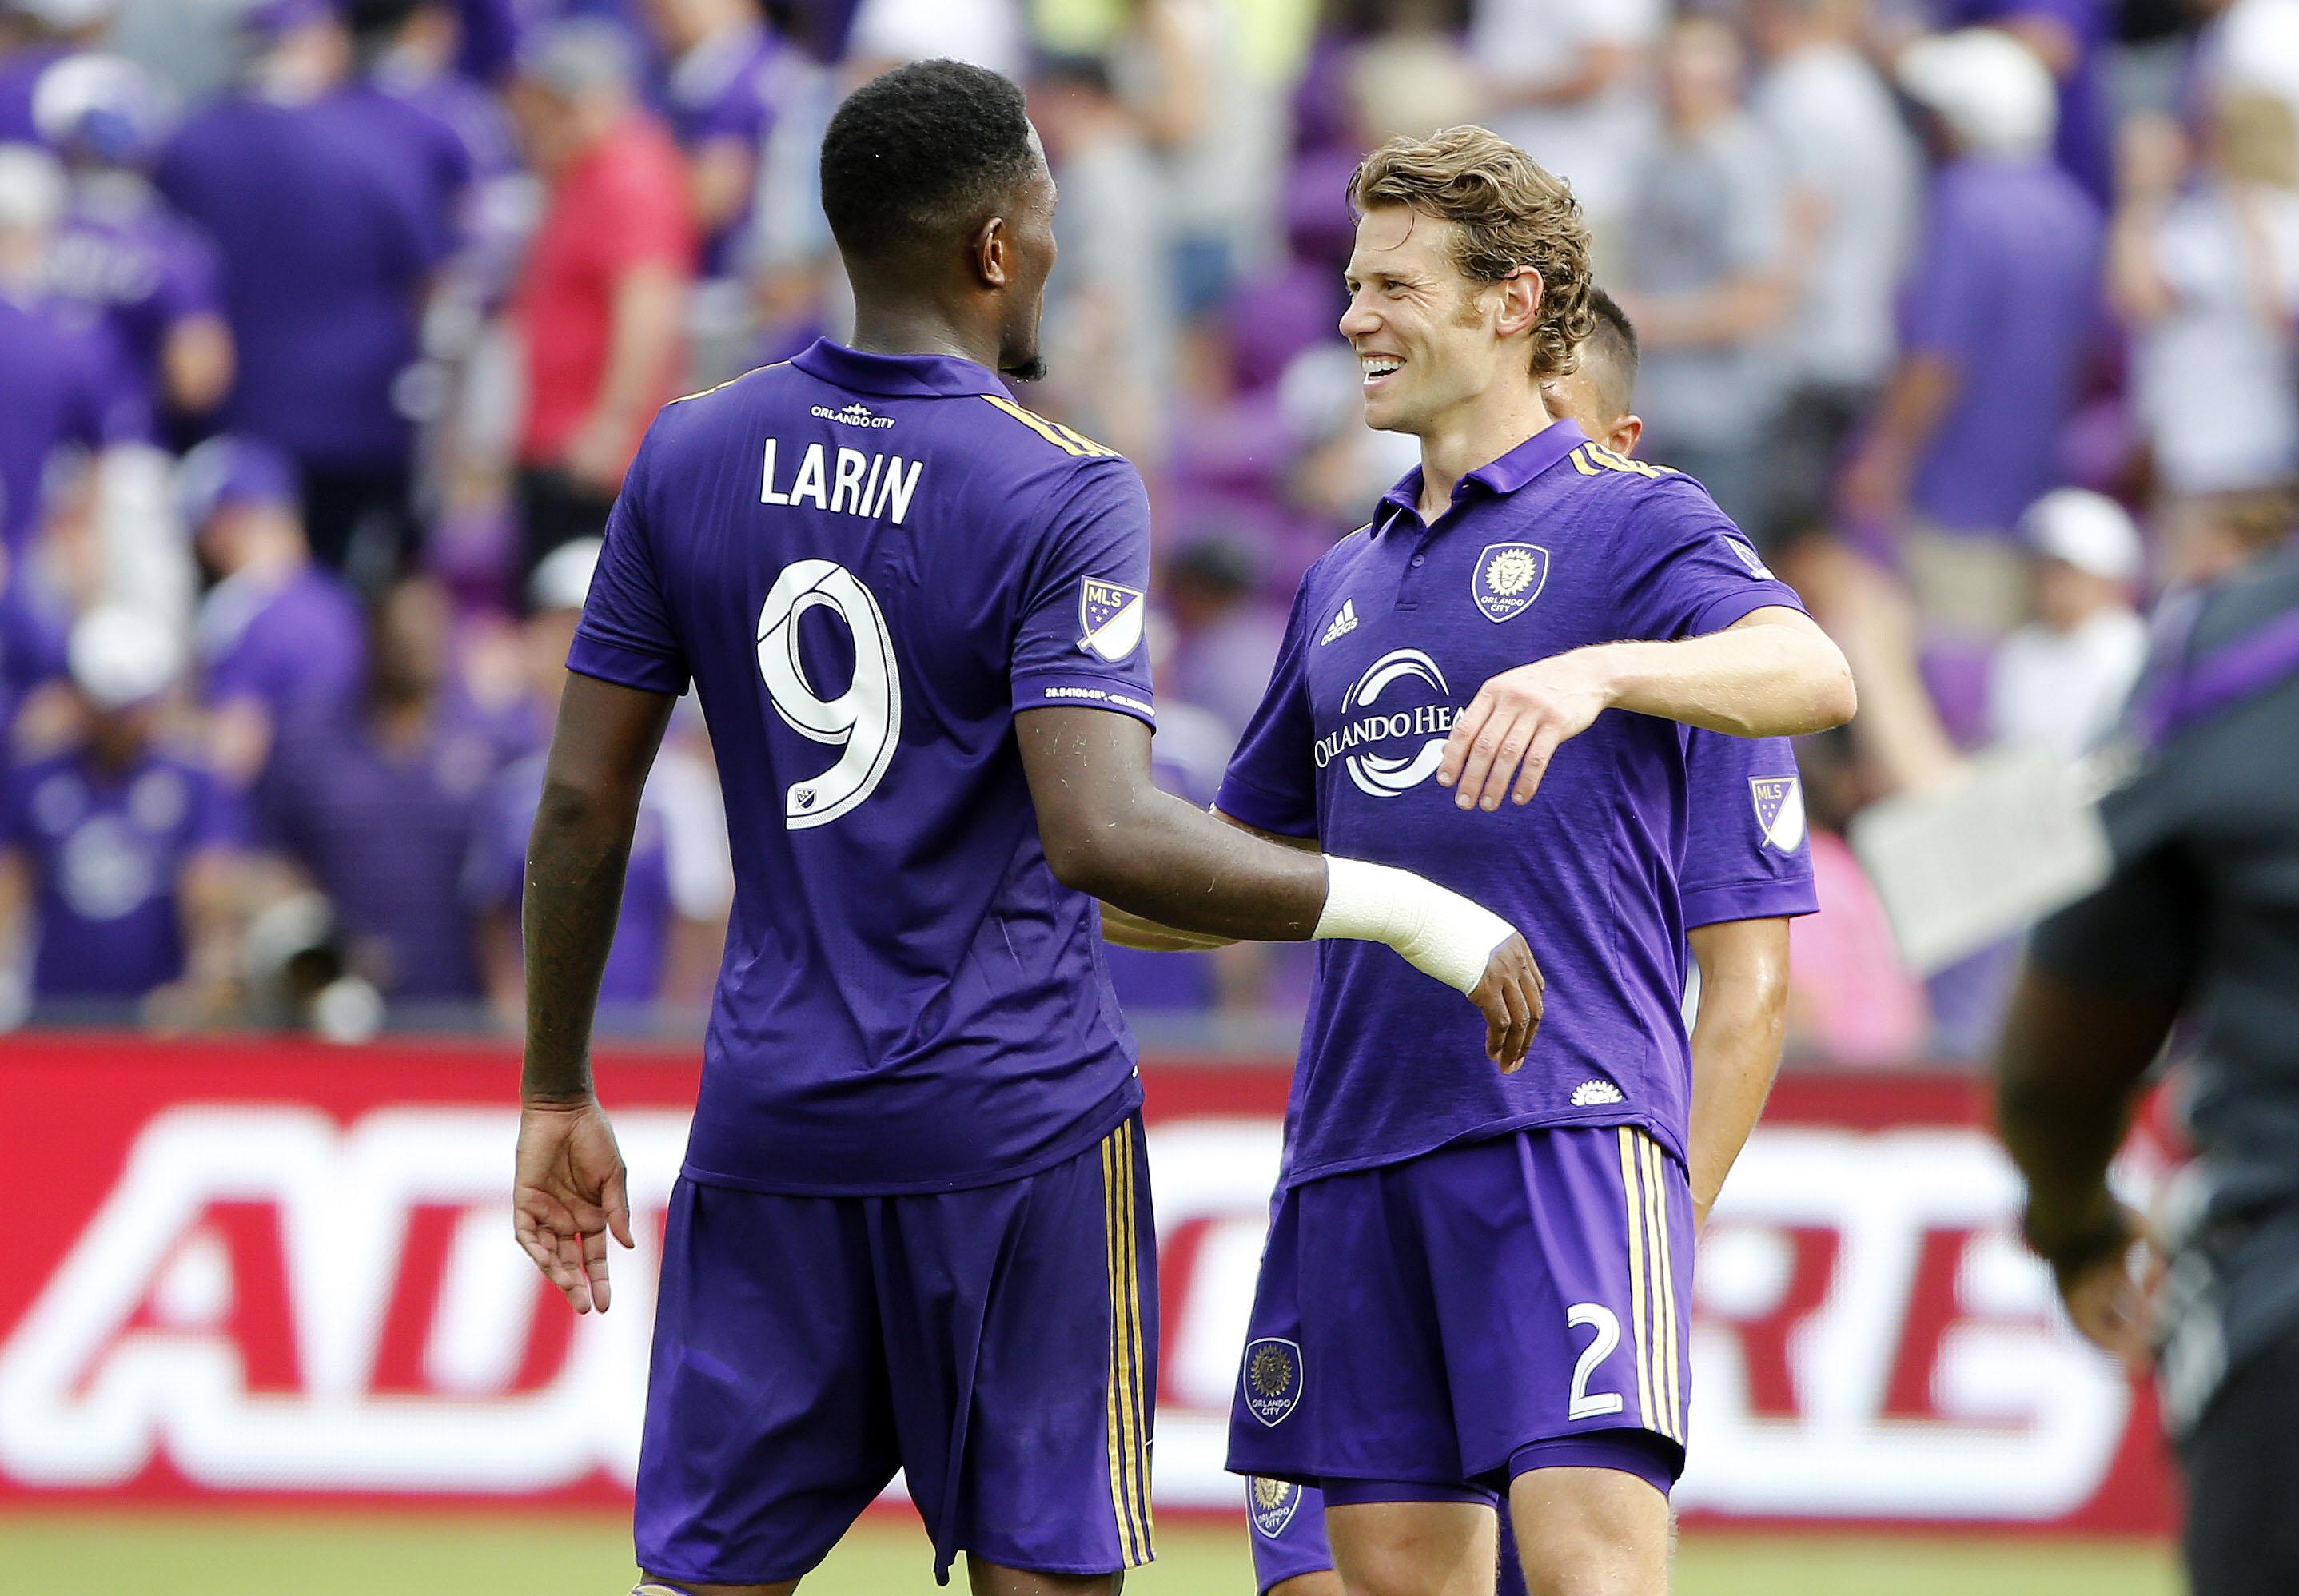 Cyle Larin scores twice, Orlando City beats NYCFC 2-1